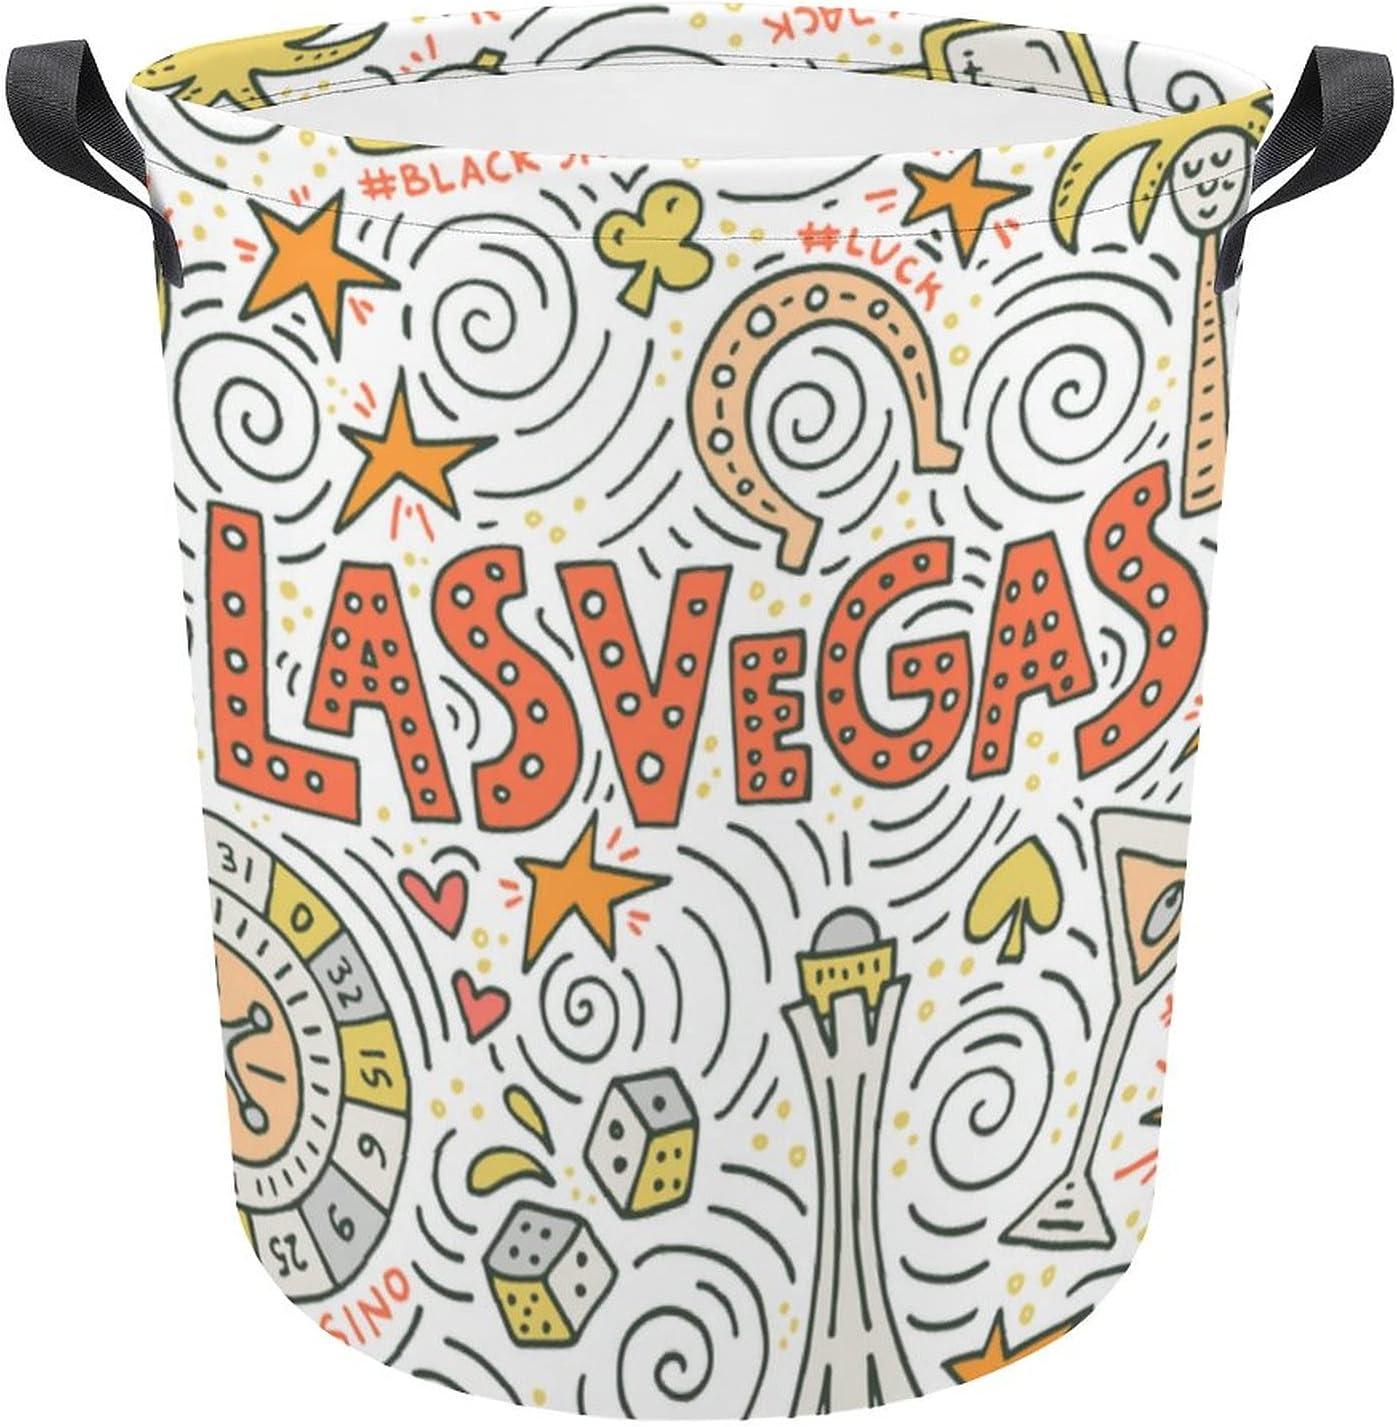 Funny Cartoon Las Los Angeles Mall Soldering Vegas Symbols Gift White Oxford Laundry Travel